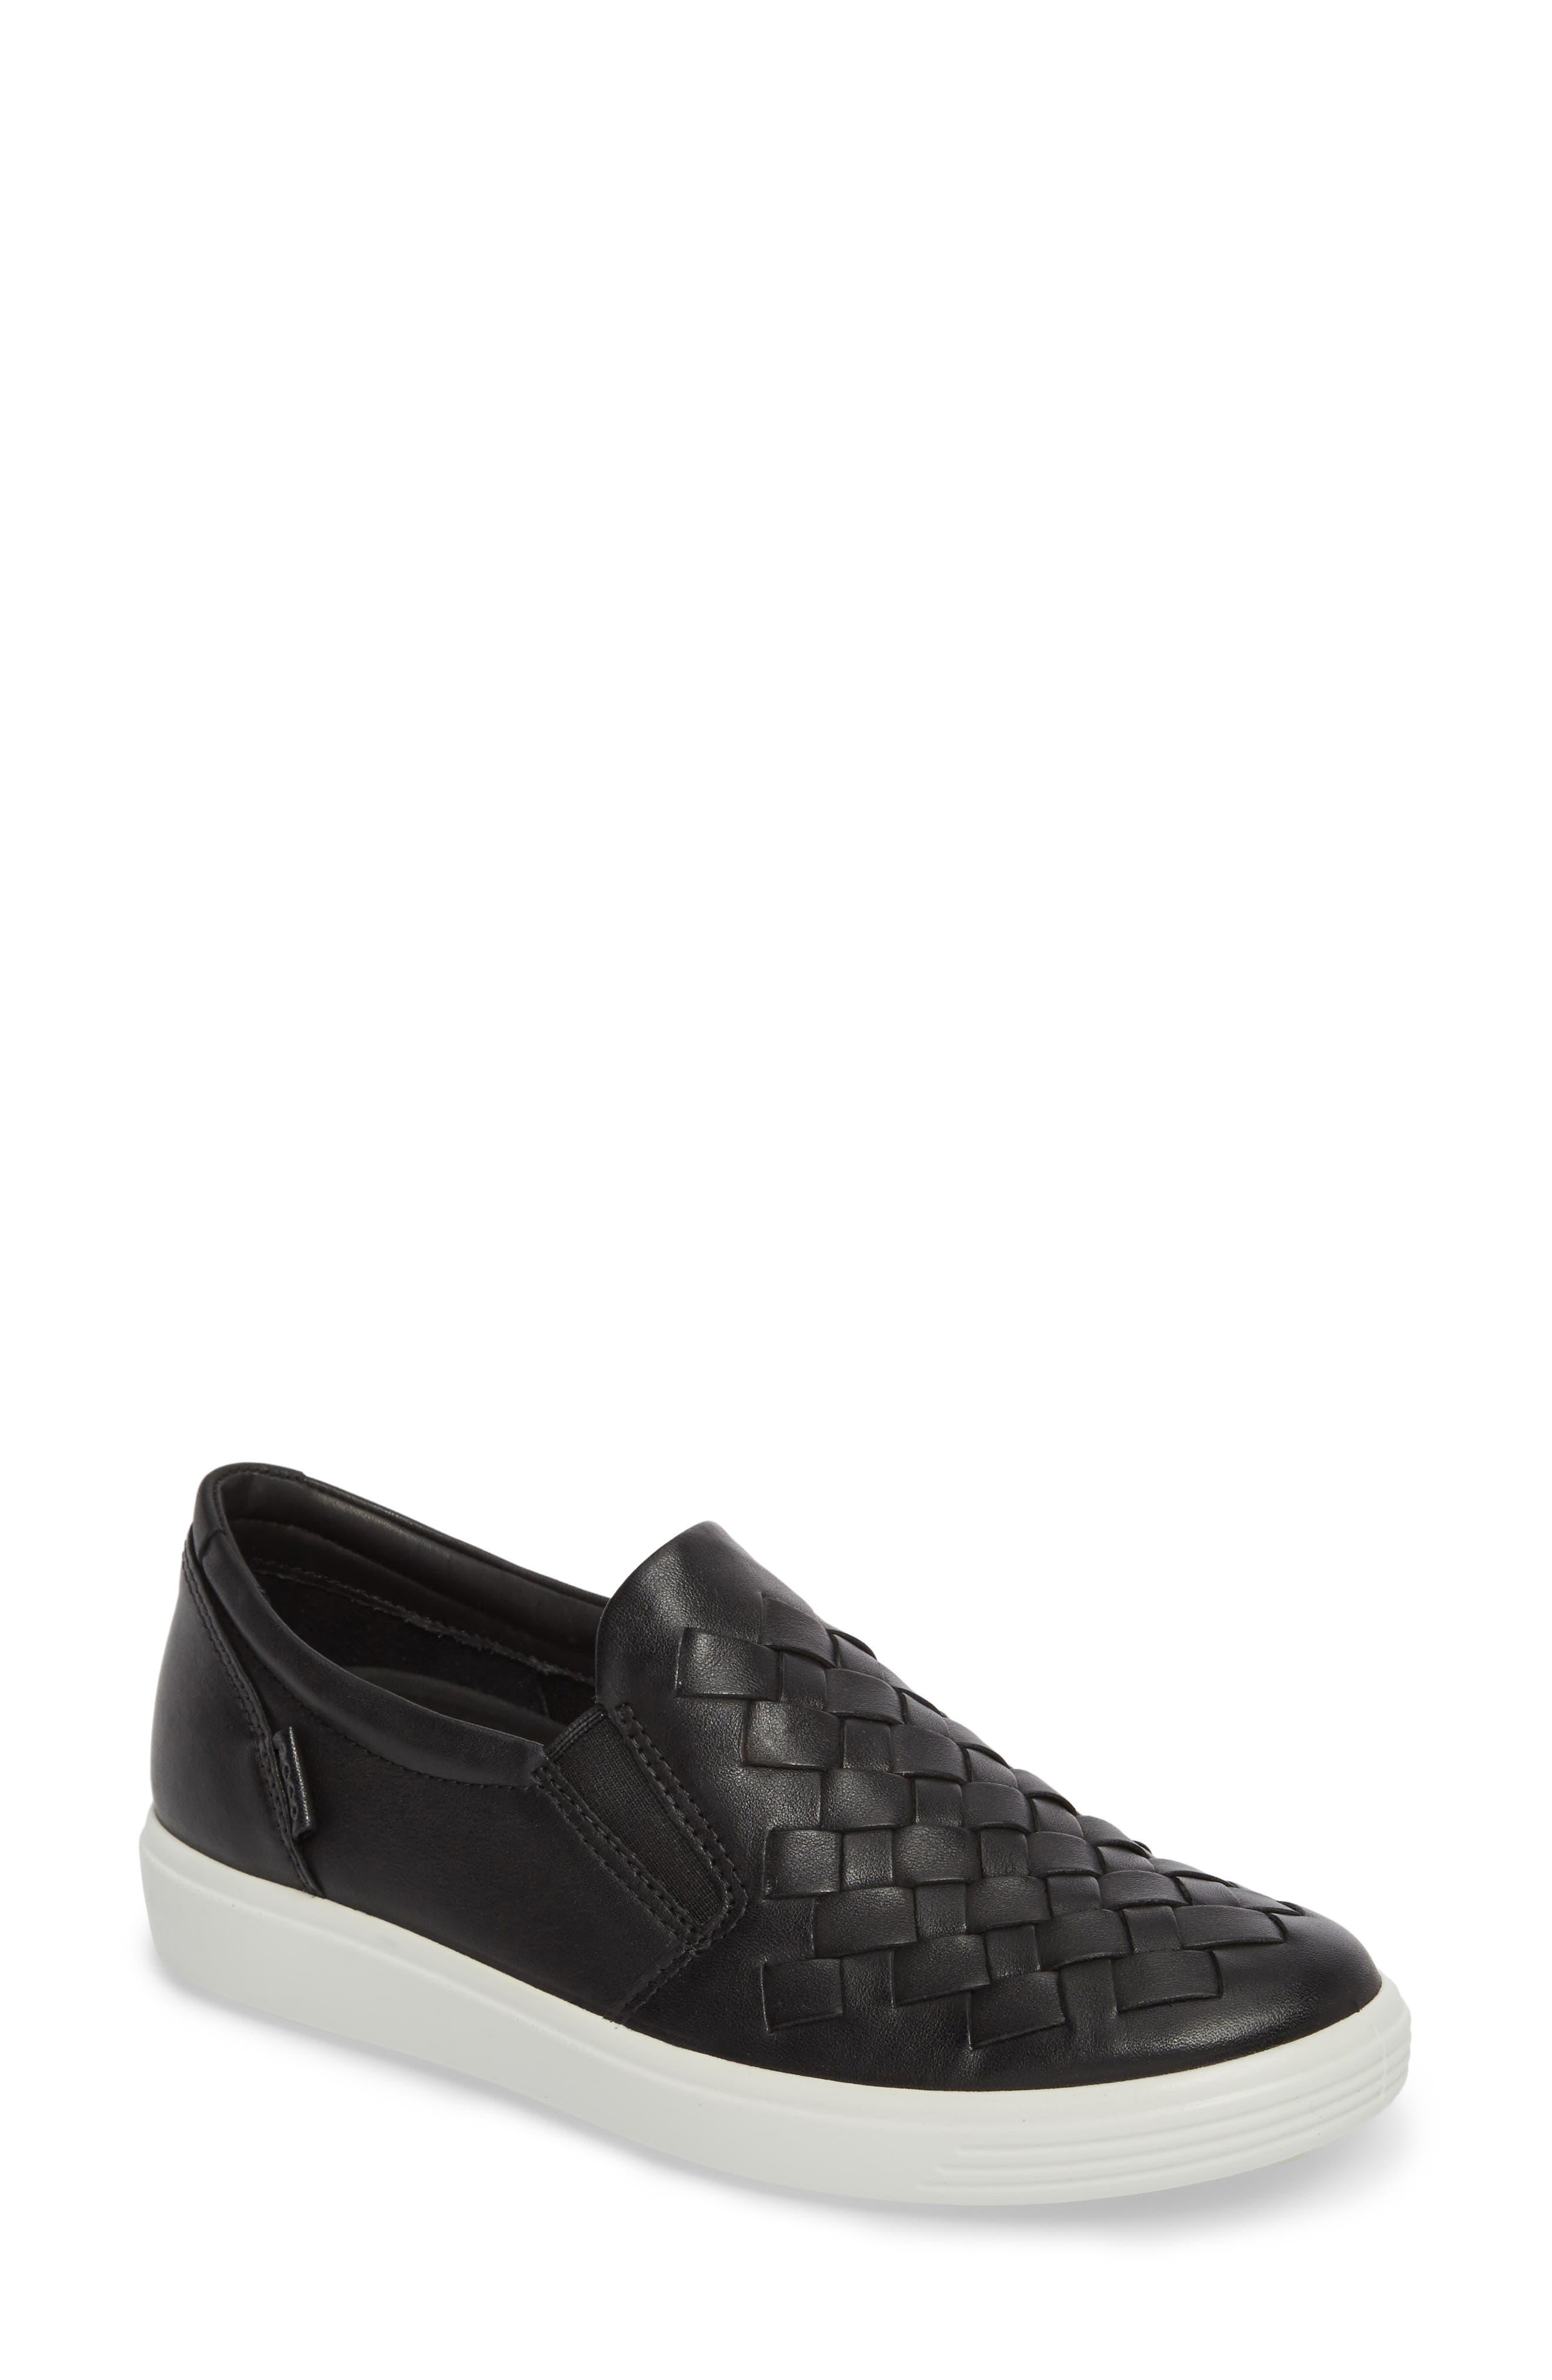 ECO Soft 7 Woven Slip-On Sneaker,                             Main thumbnail 1, color,                             Black Leather